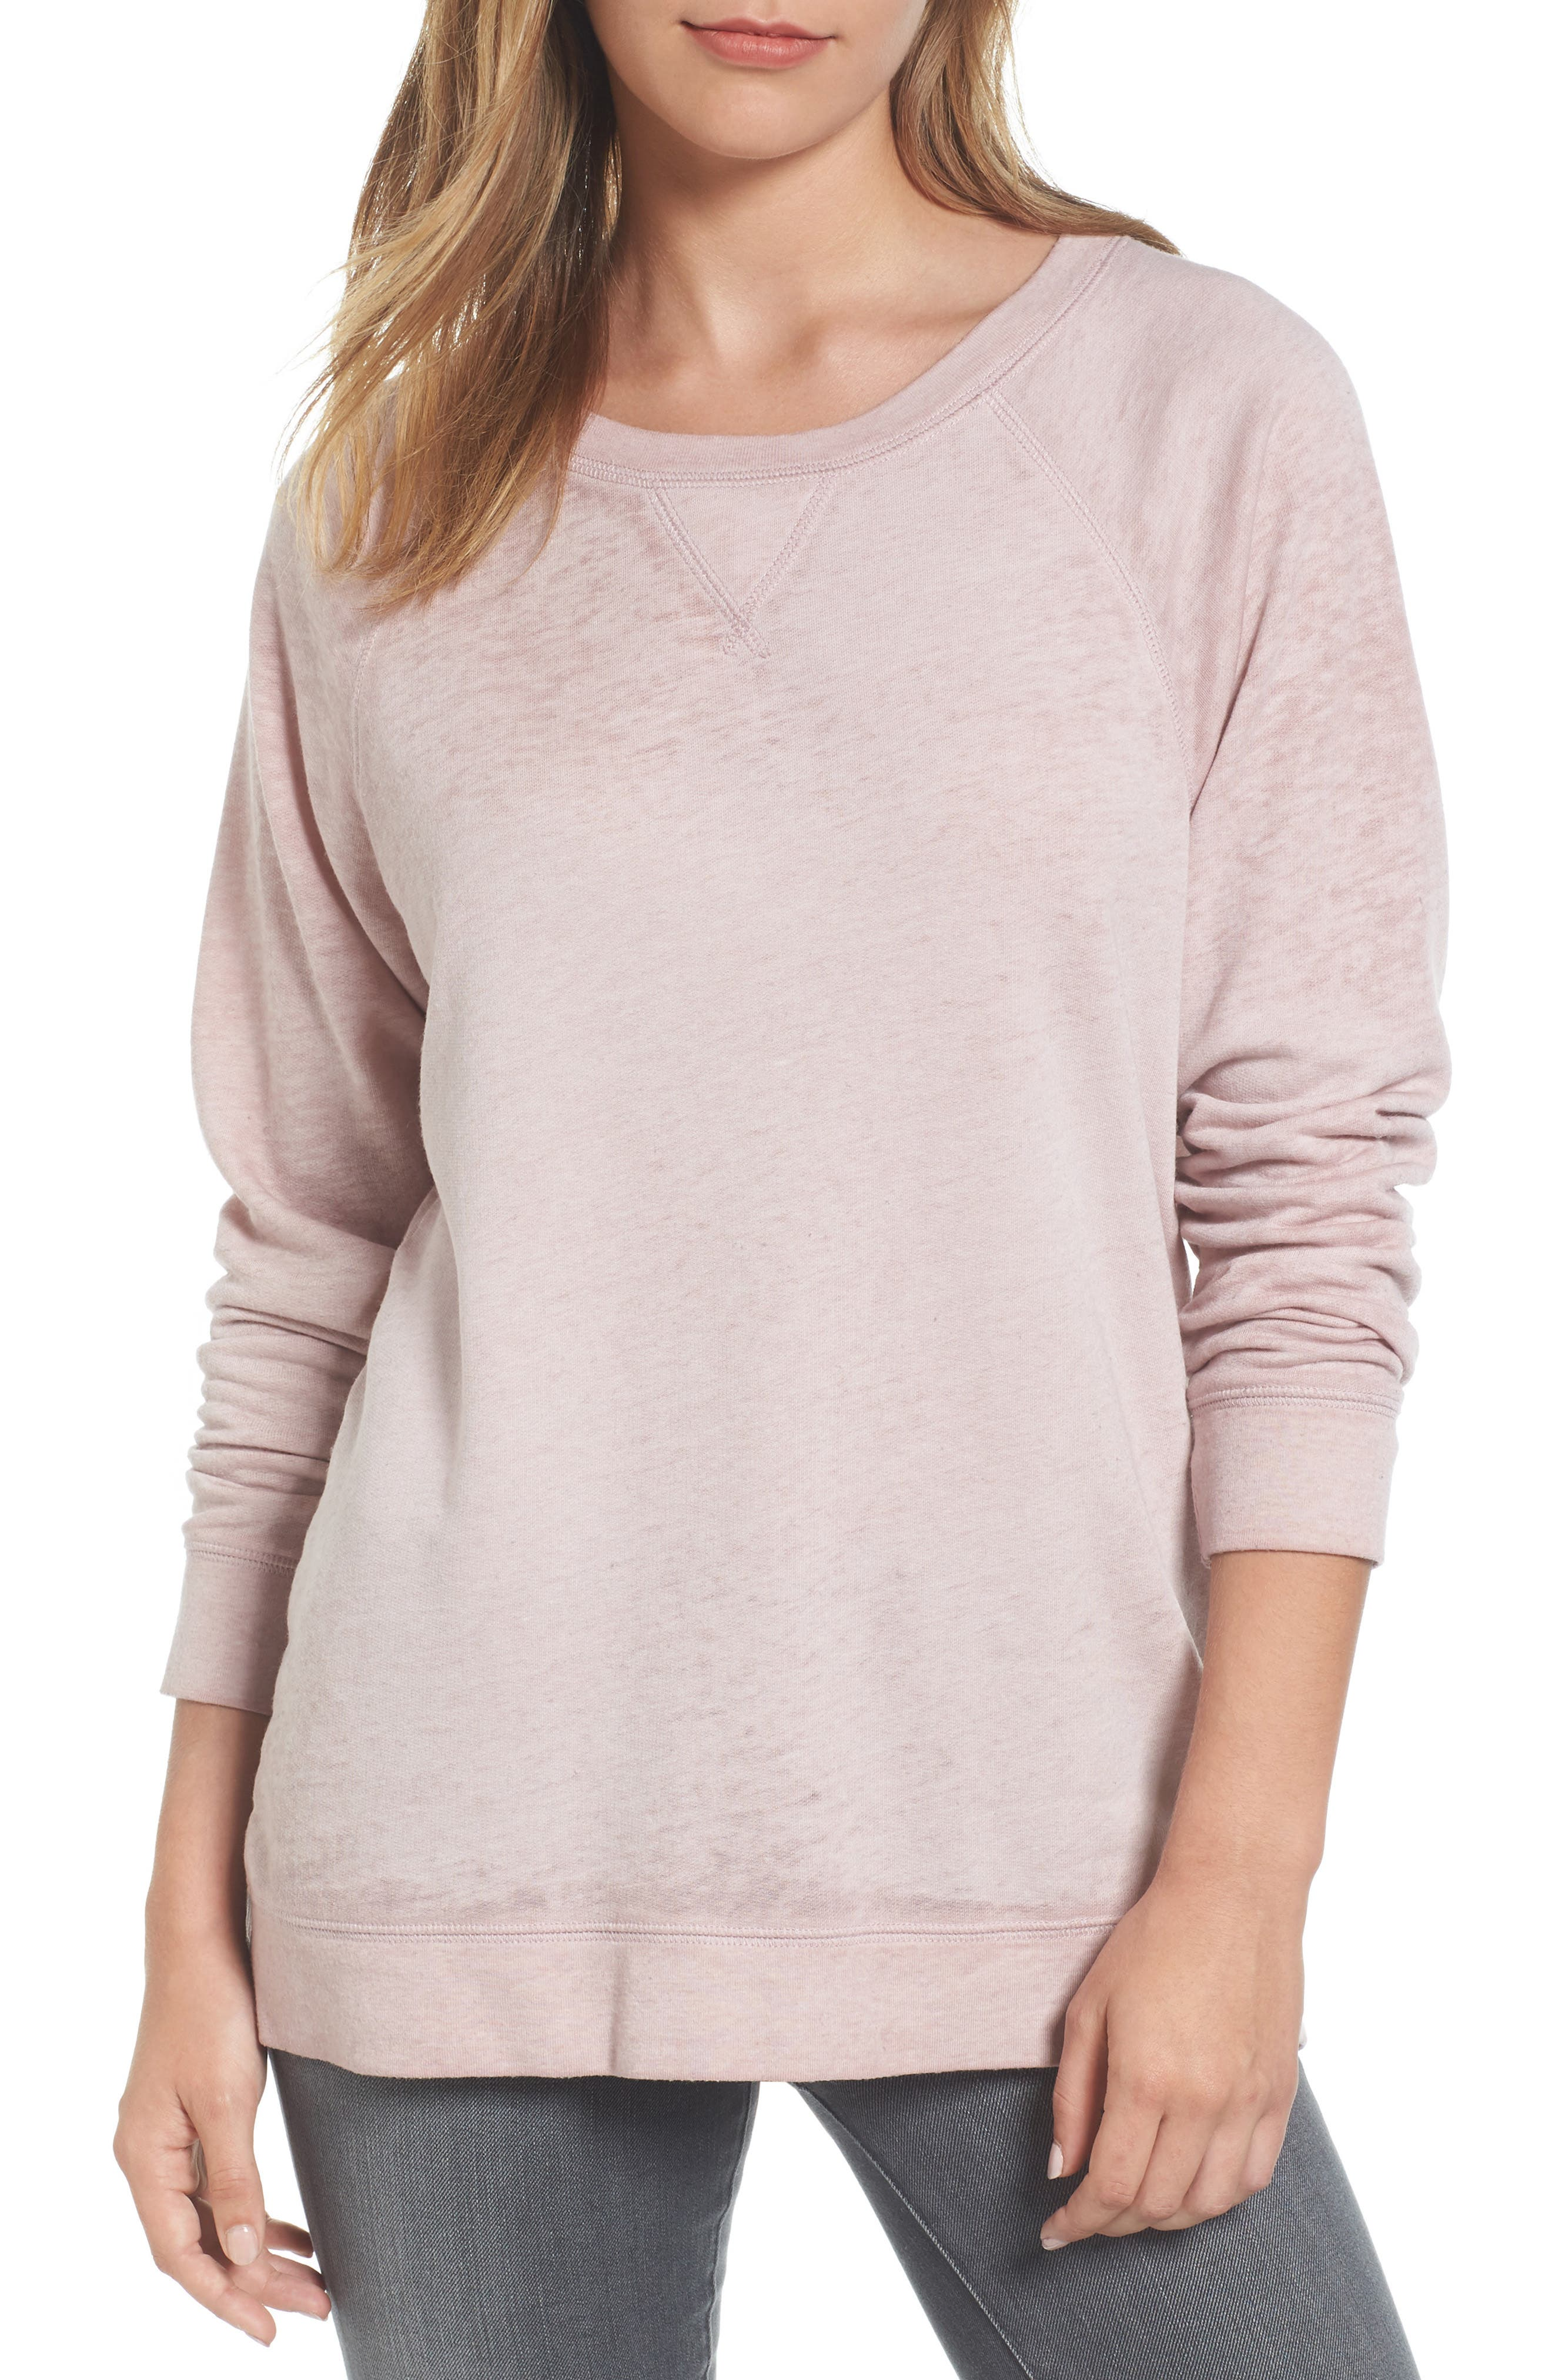 Alternate Image 1 Selected - Caslon® Burnout Sweatshirt (Regular & Petite)